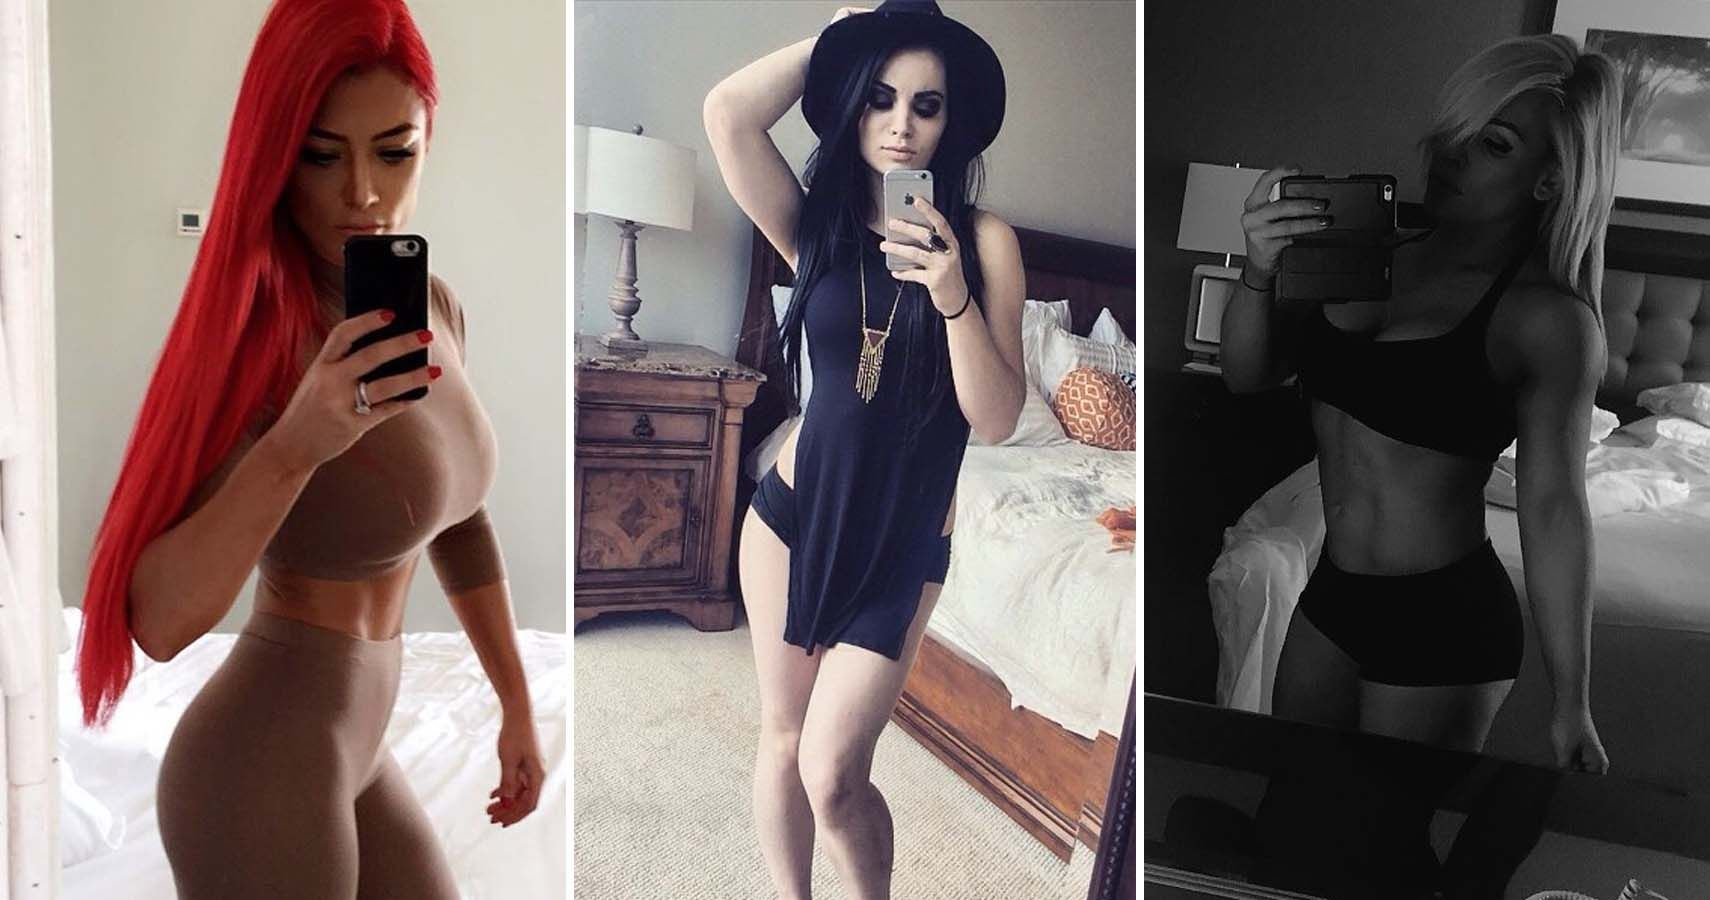 Top 20 Hottest Female Wrestler Selfies